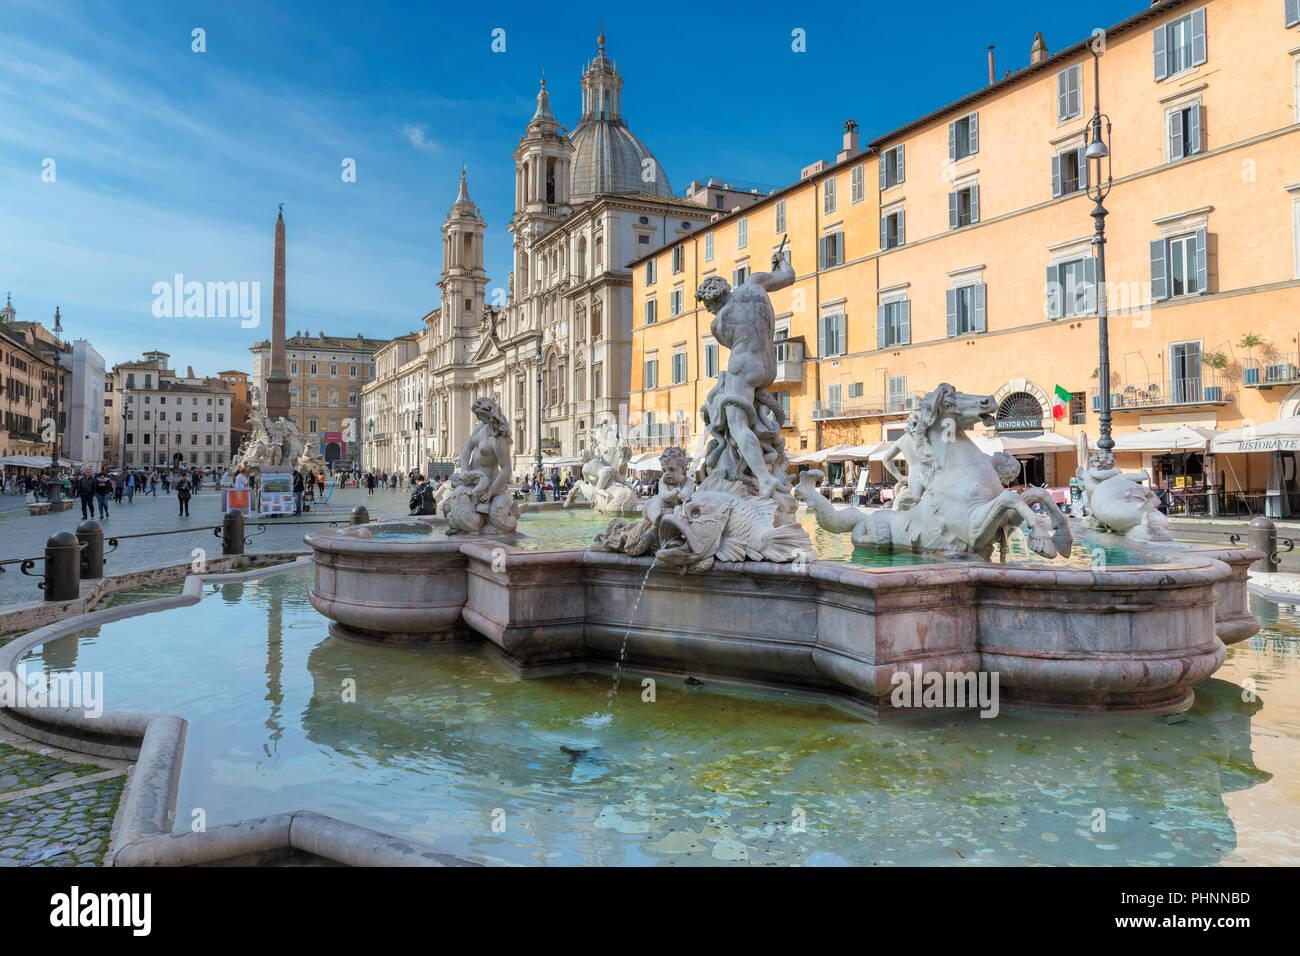 Die Piazza Navona in morgen in Rom, Italien, Europa. Stockbild